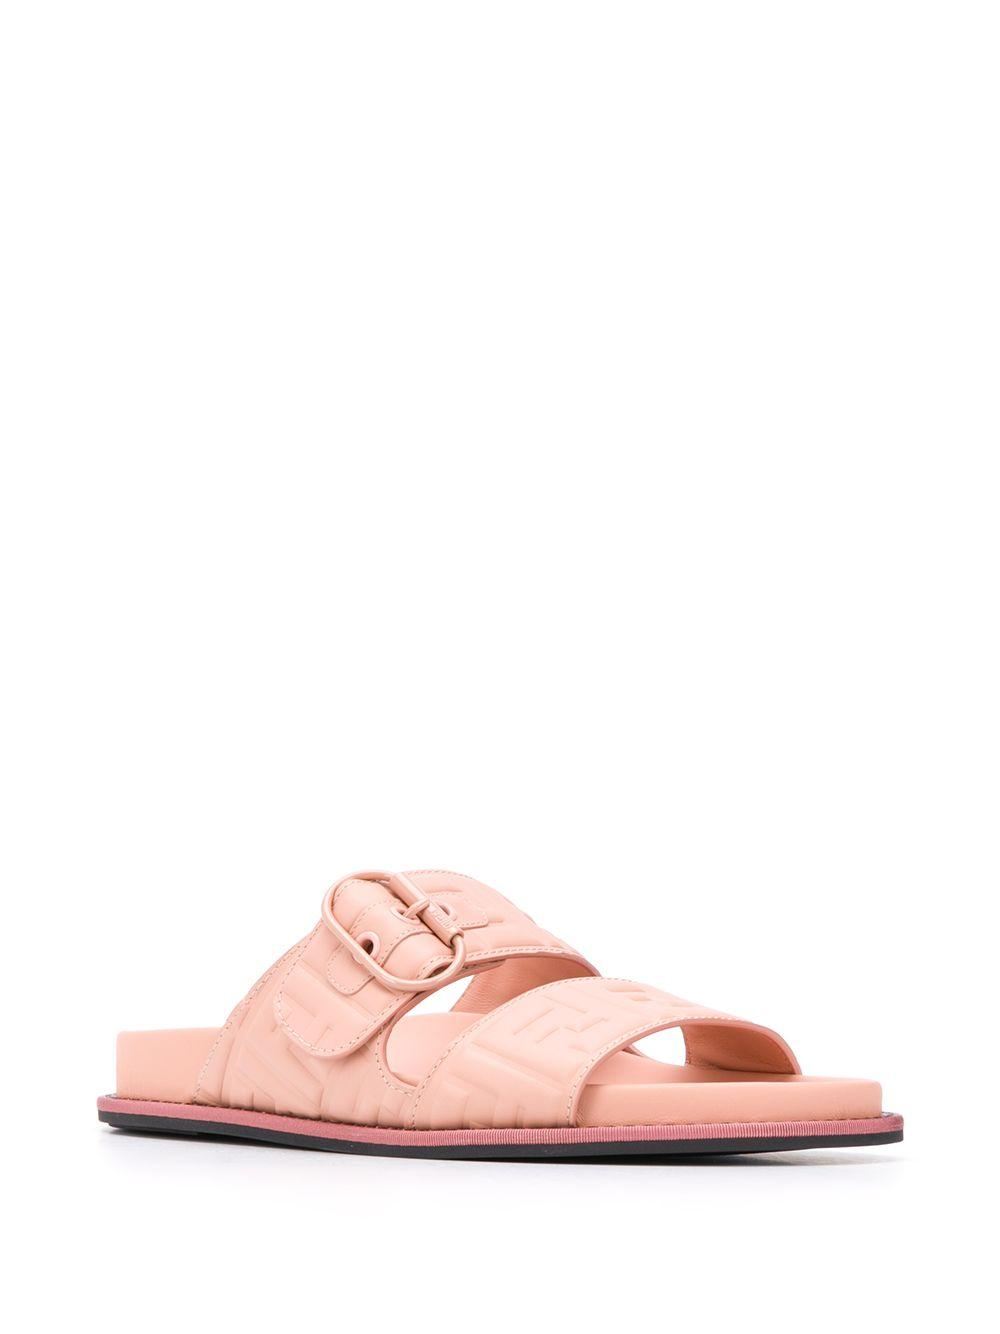 fendi pink sandals